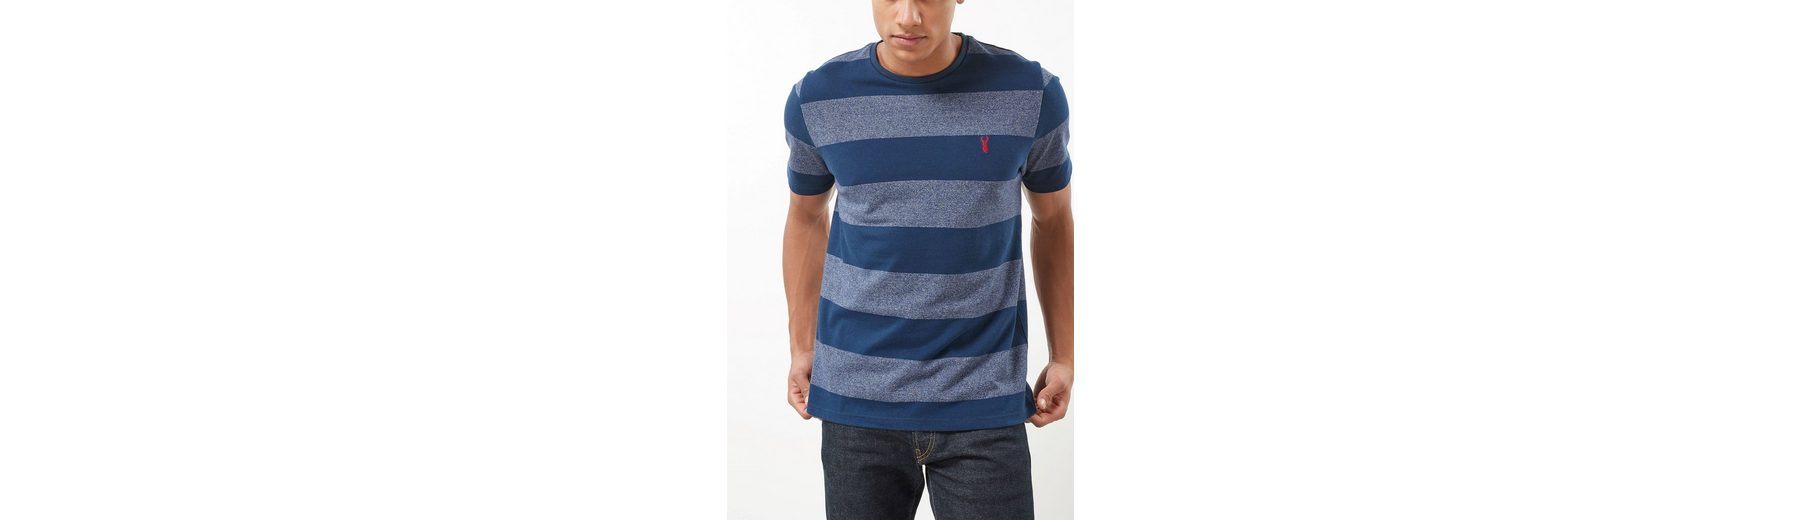 mit Streifen Jacquard Jacquard mit Jacquard Shirt Shirt Next Streifen T Next T T Next a5xdqawOSW